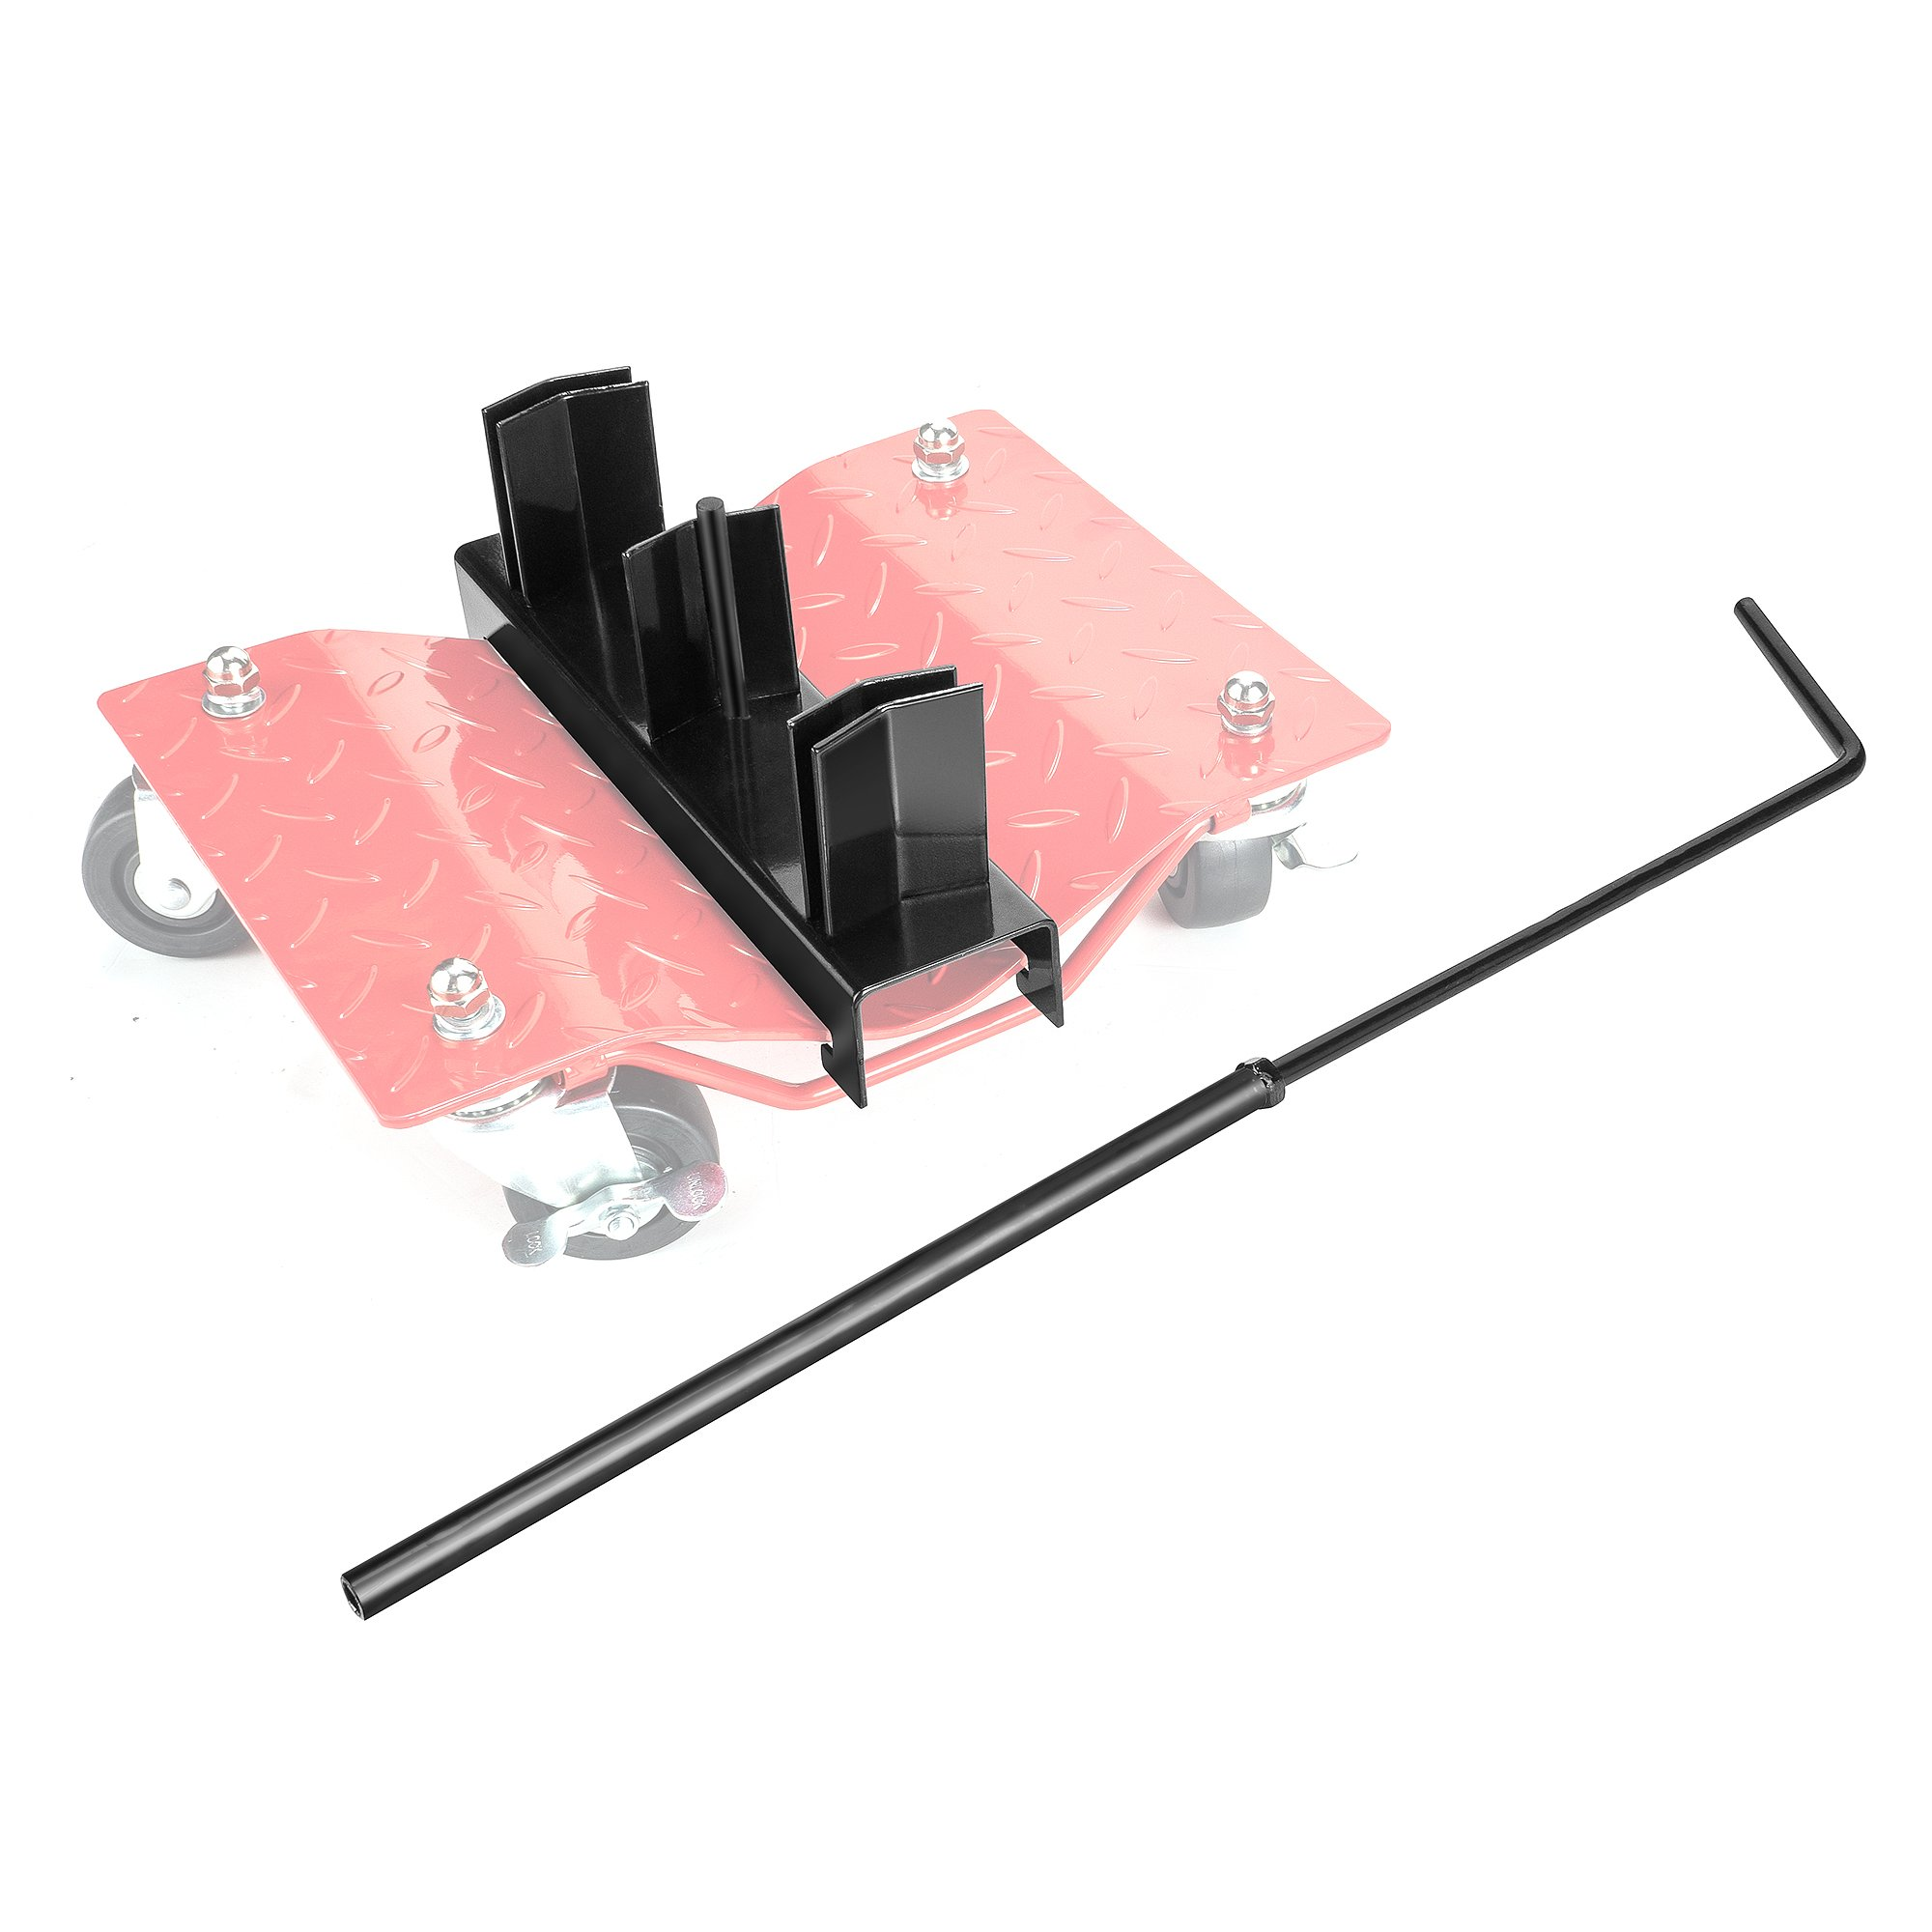 Pentagon 83-DT5506 Tool | Tire Skate-Wheel Dolly Rack | with Handle | Black